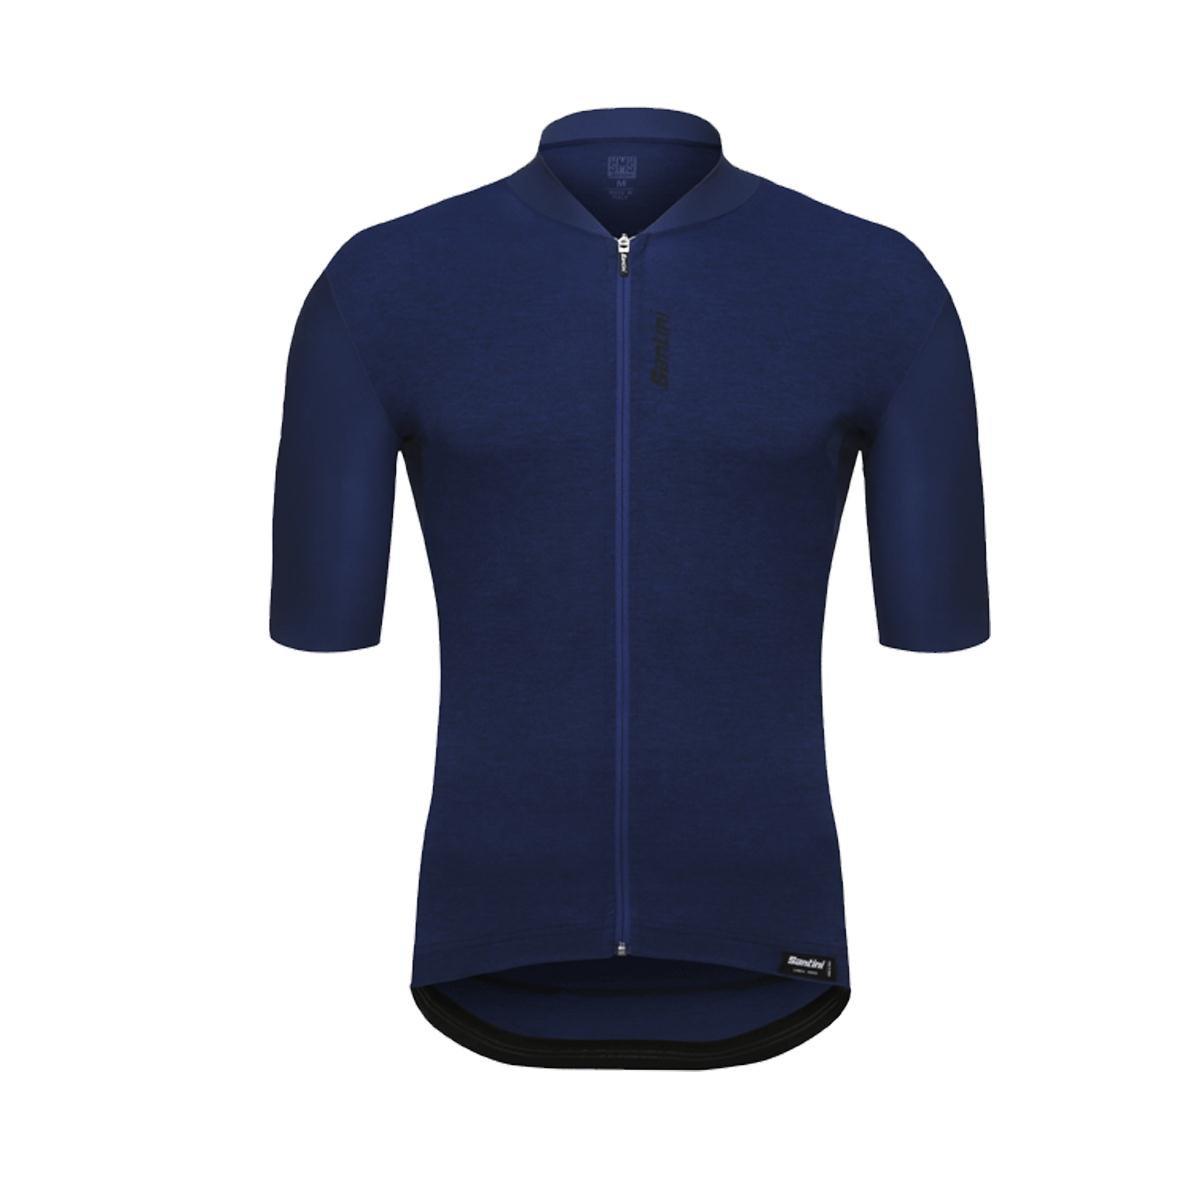 Santiniブルー365 Classe Short Sleeved Cycling Jersey X-Large  B07C59B8CY